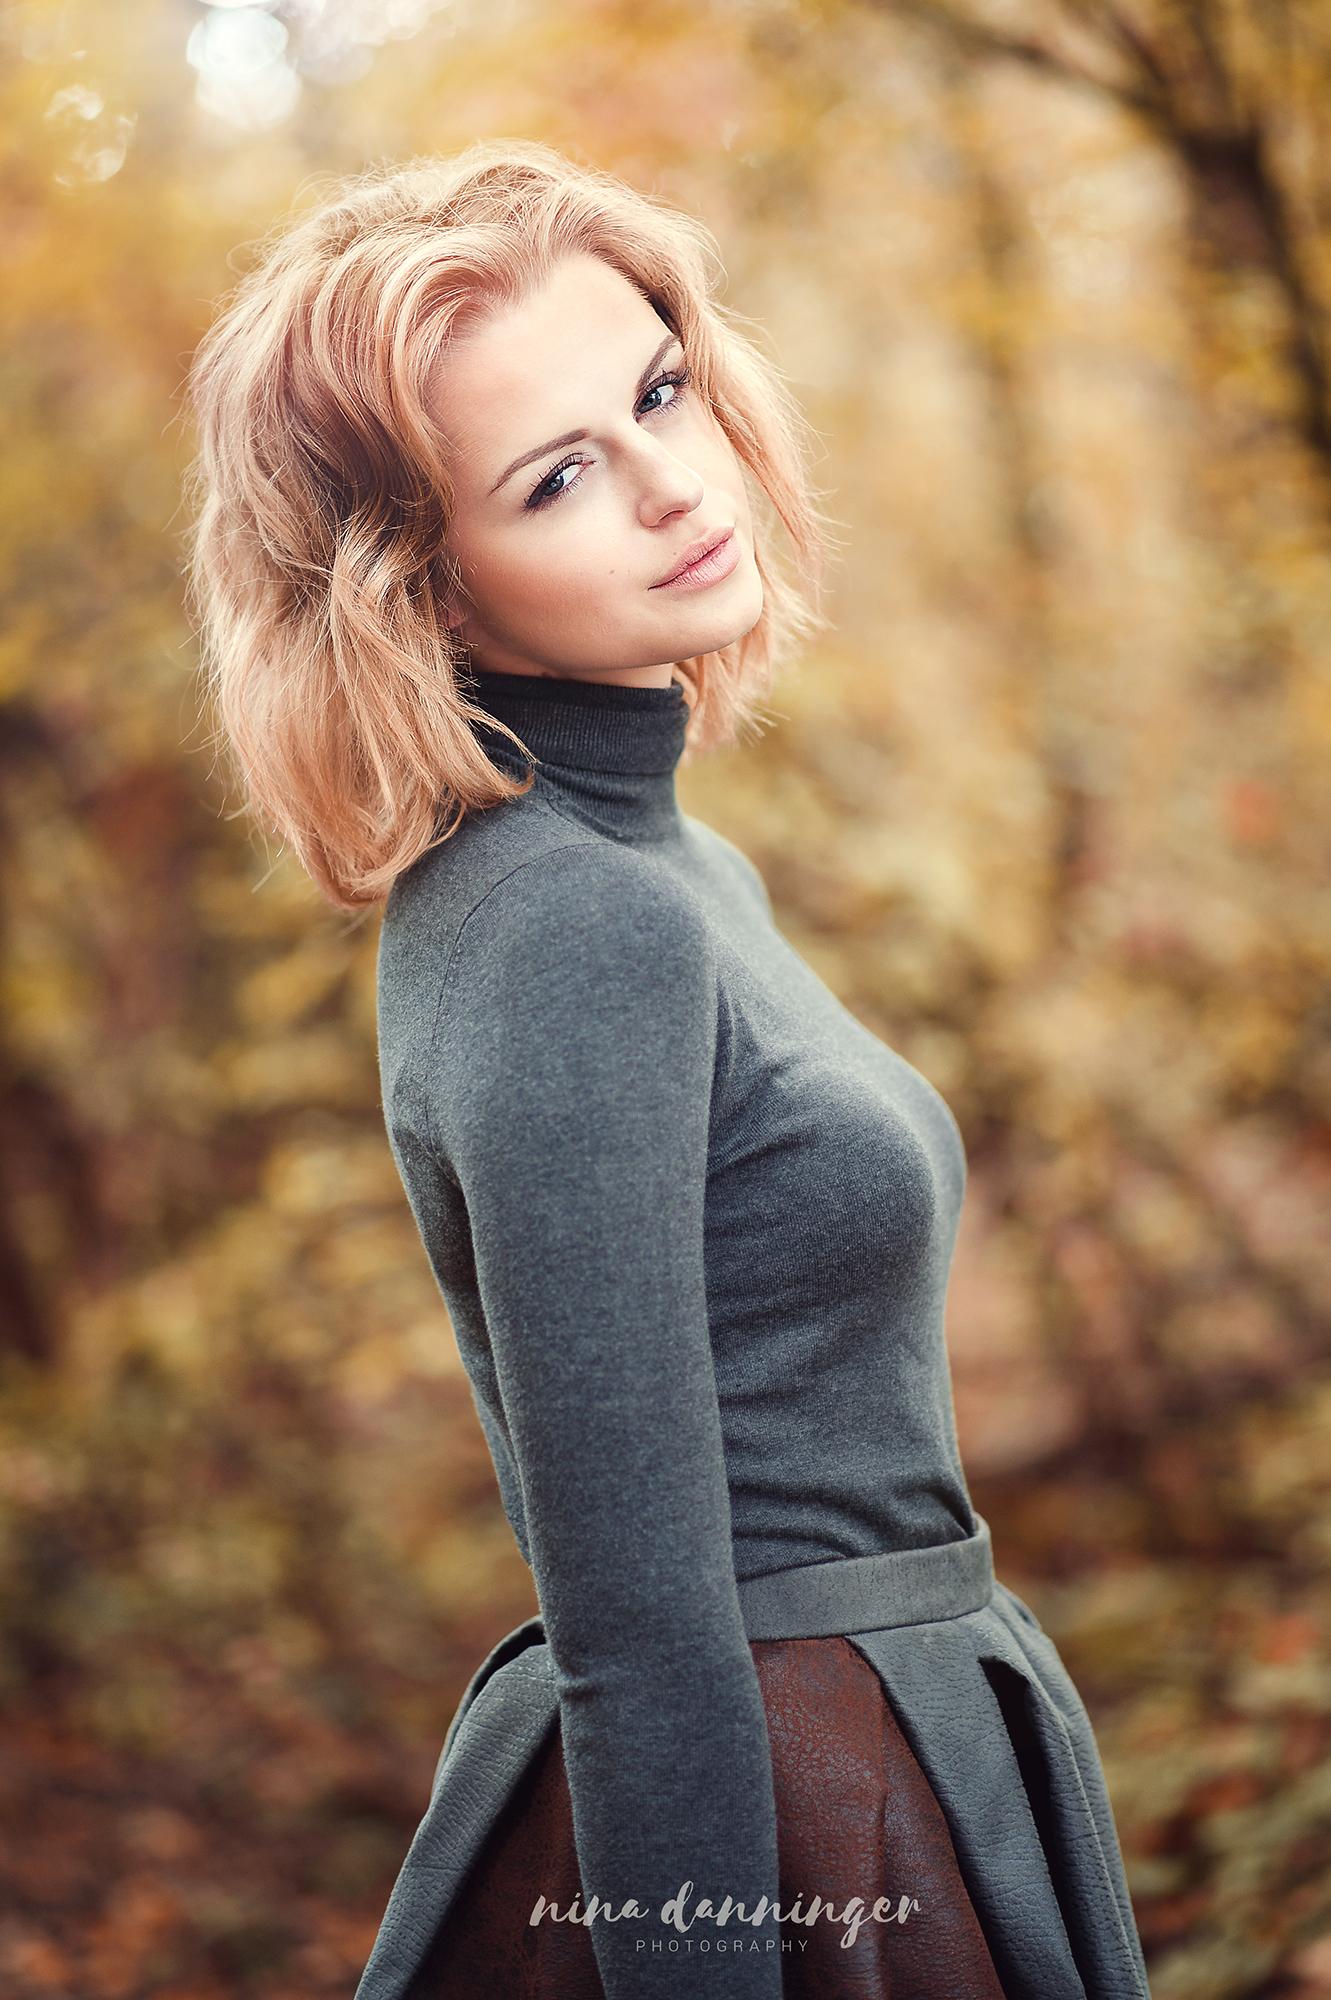 Herbst Outdoor Portrait Nina Danninger Photography - Linzer Berufsfotograf